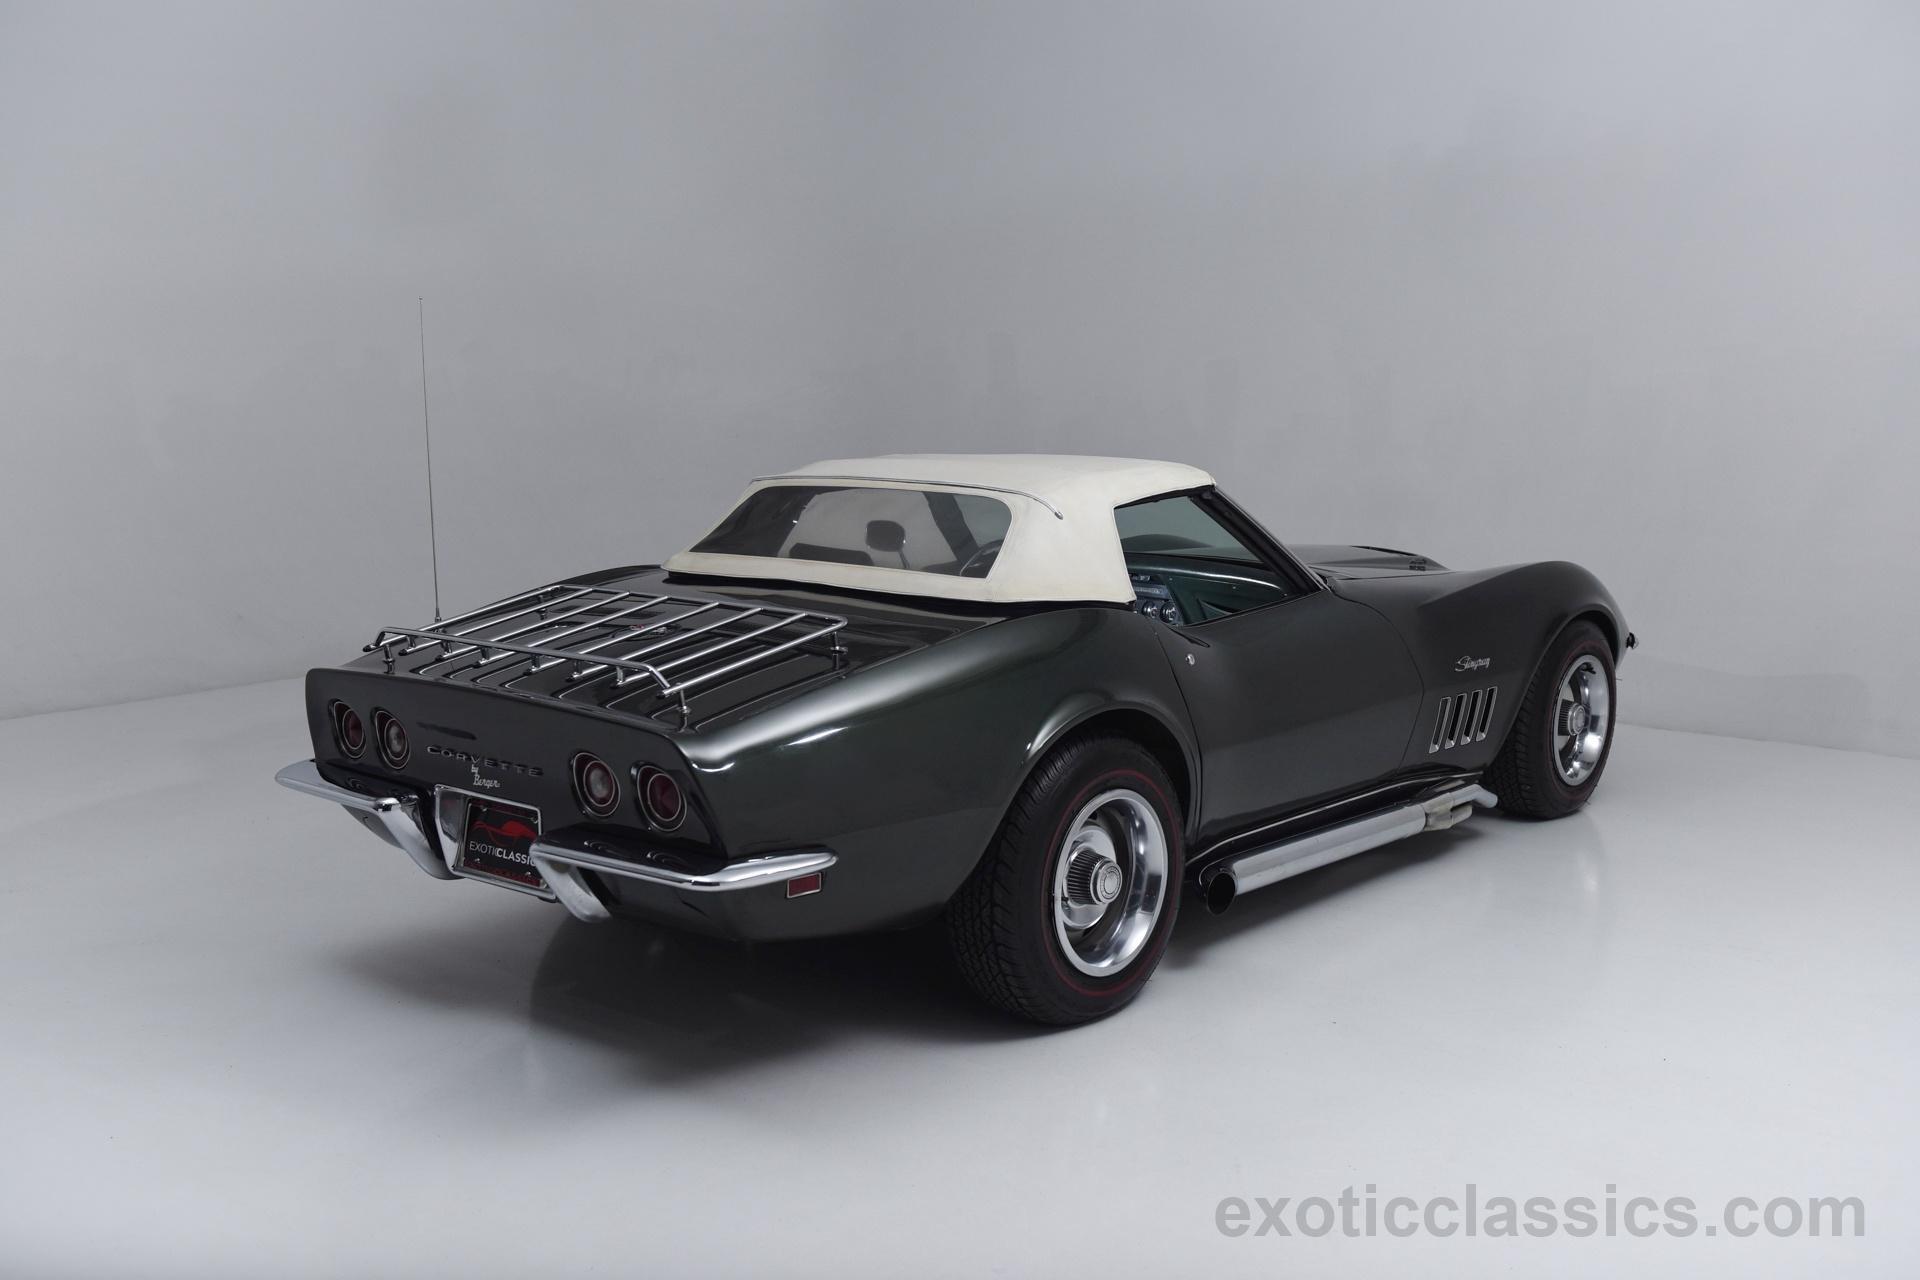 1969 chevrolet corvette stingray c3 convertible classic cars dark green wallpaper 1920x1280 699340 wallpaperup - Corvette Stingray 1969 Wallpaper